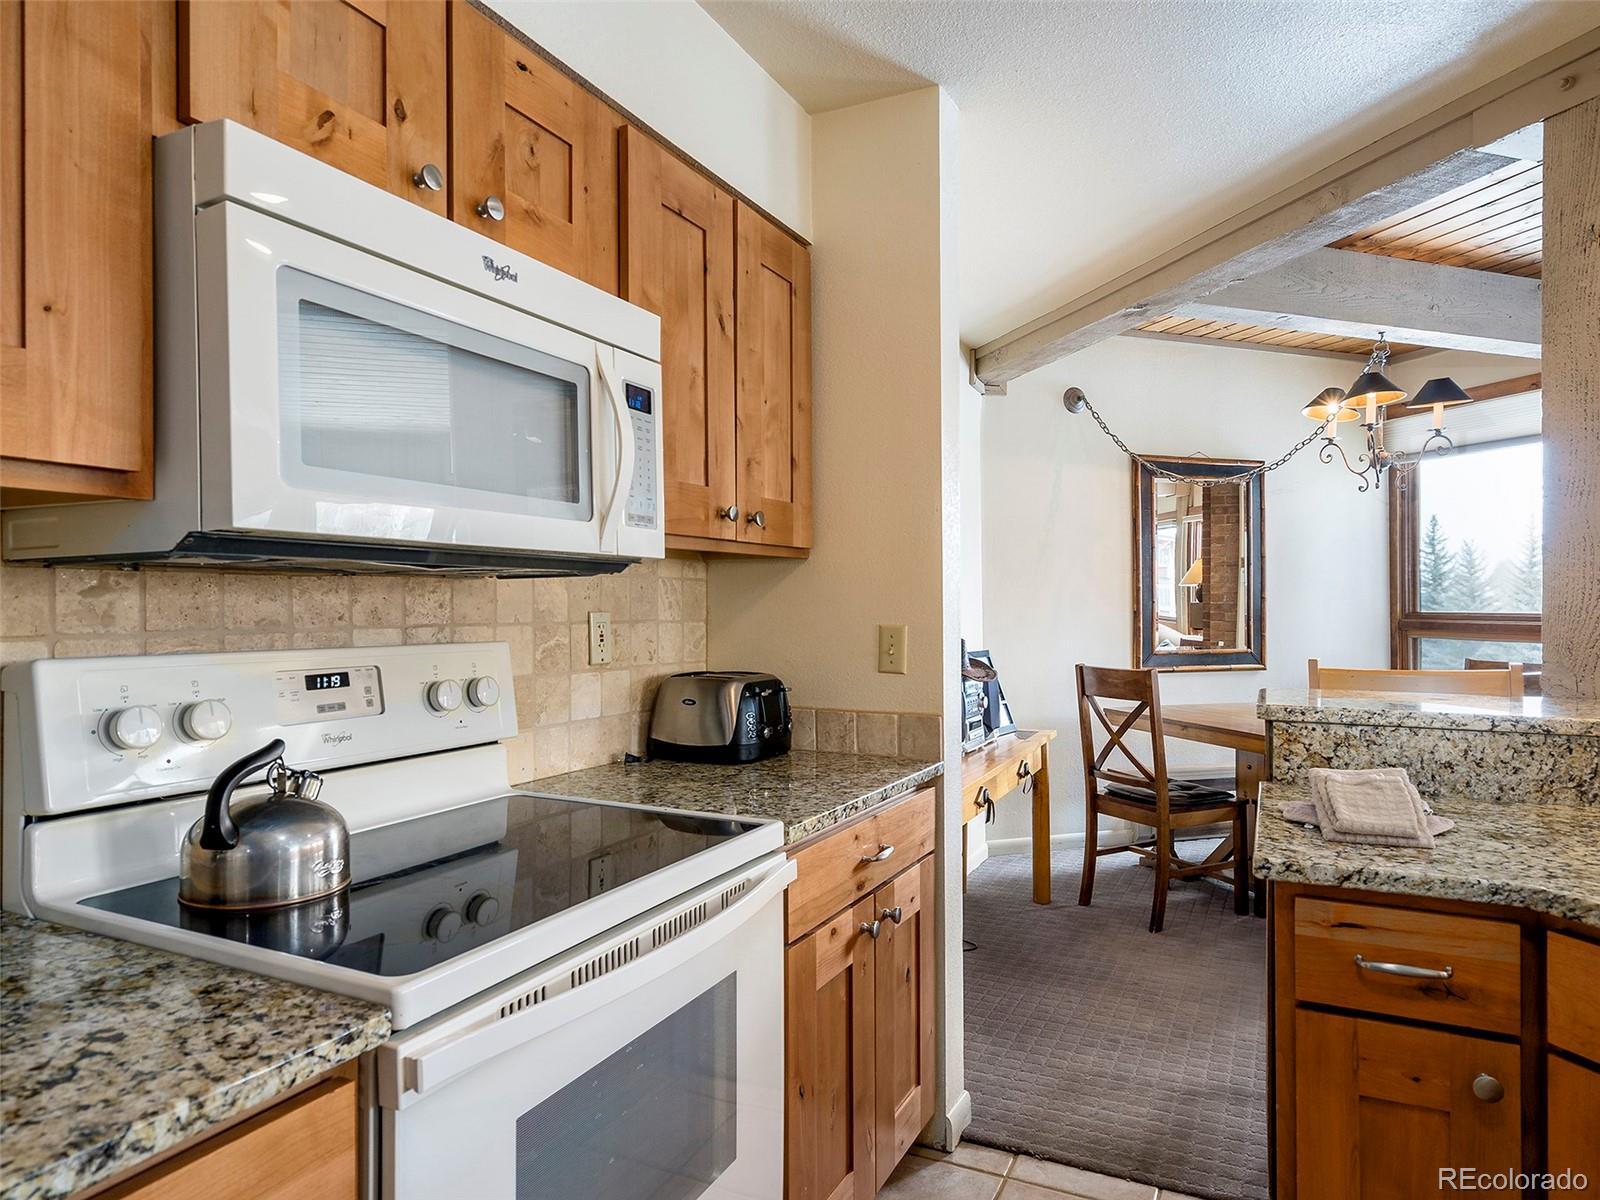 MLS# 4193338 - 7 - 2700 Village Drive #D-204, Steamboat Springs, CO 80487